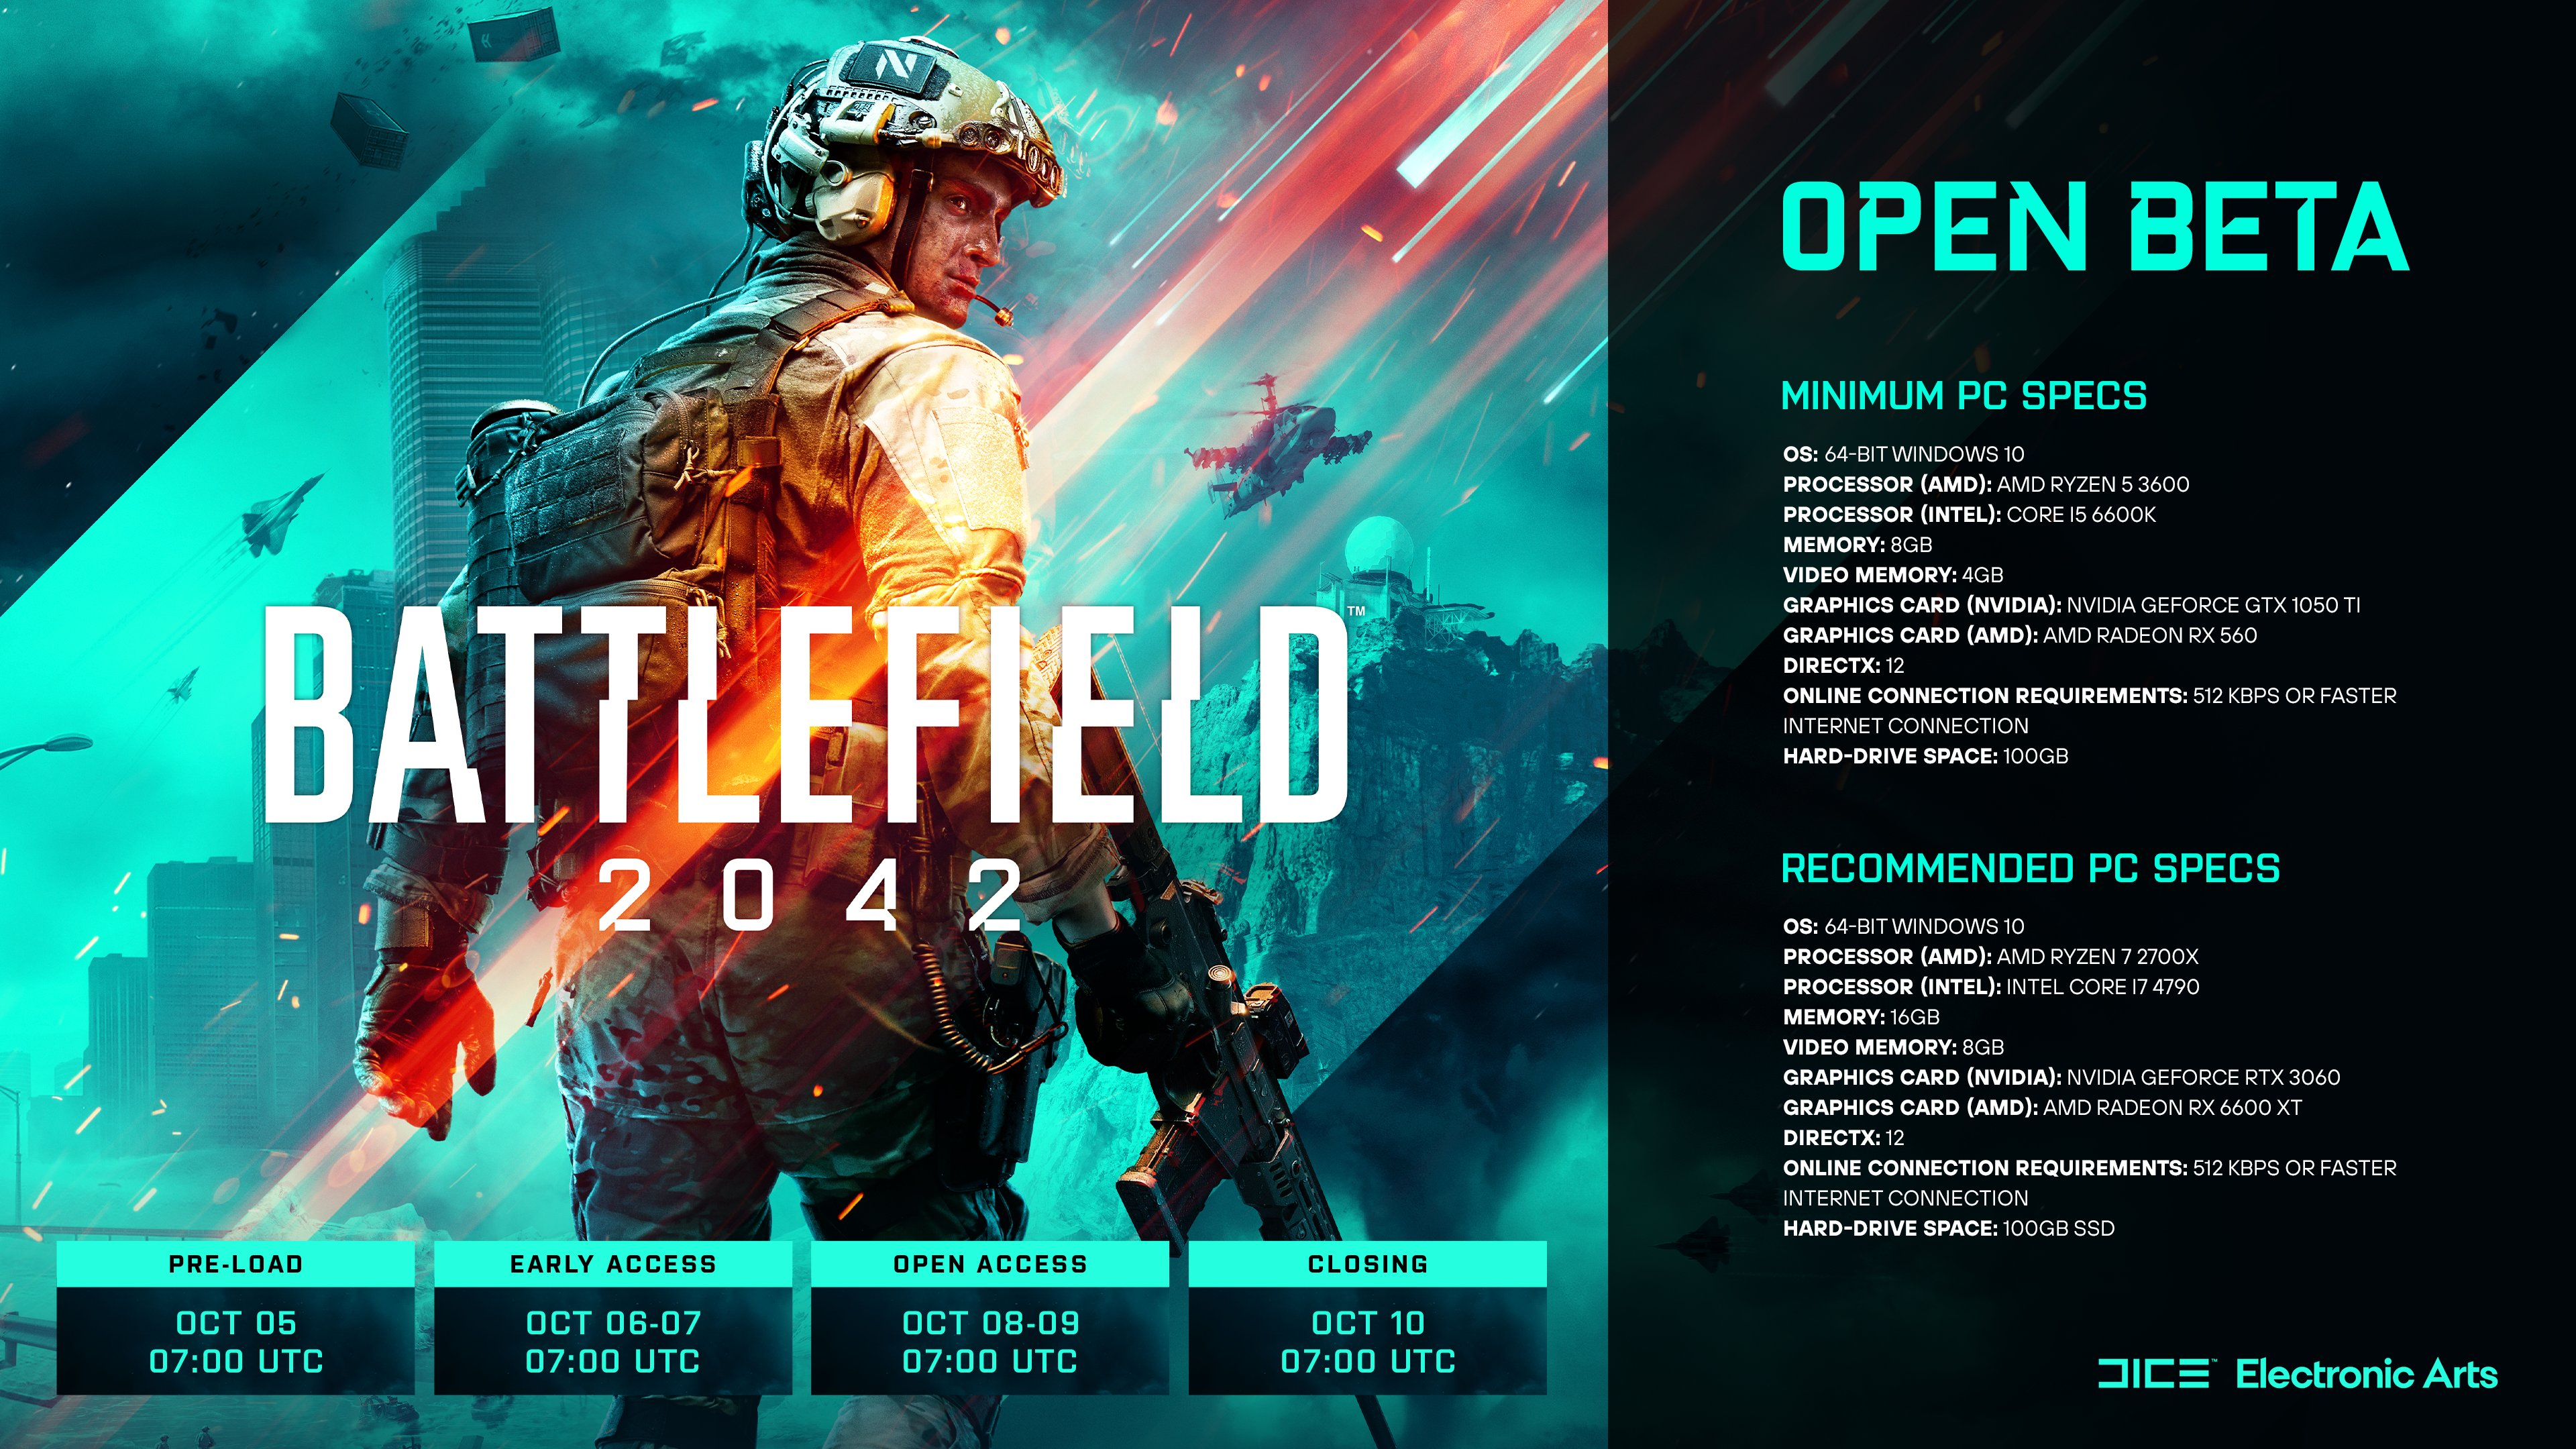 Battlefield 2042 beta PC requirements